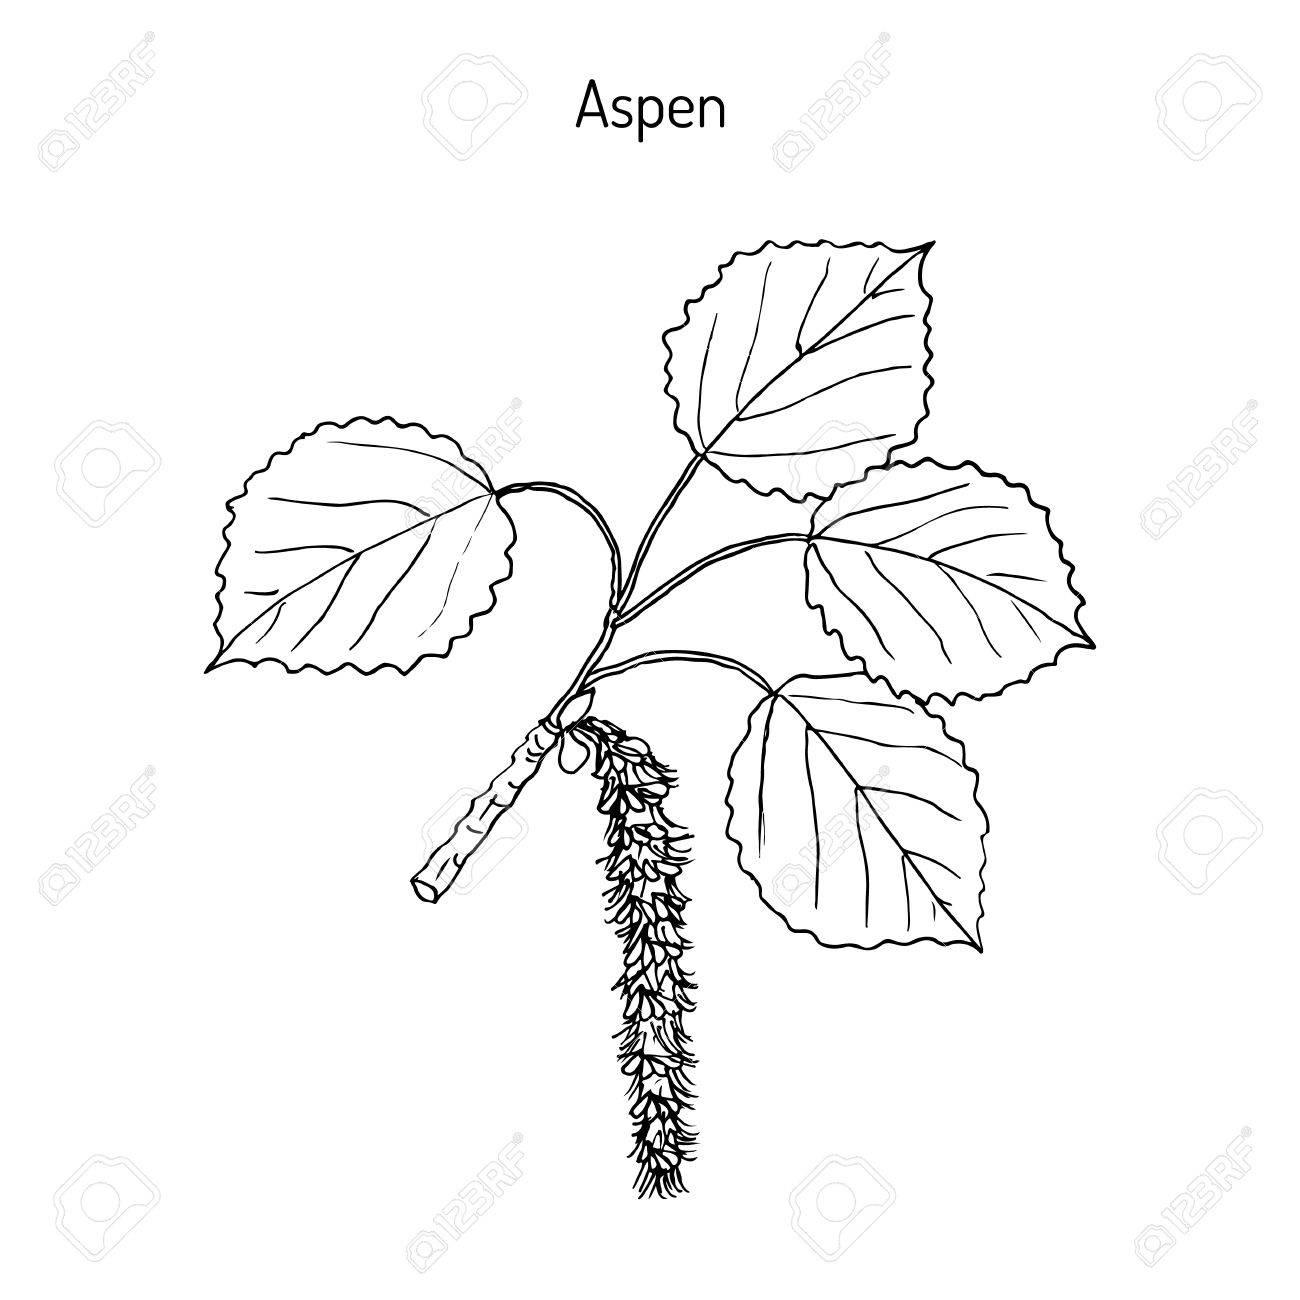 1300x1300 Aspen (Populus Tremula), Or Common Aspen, Eurasian Aspen, European